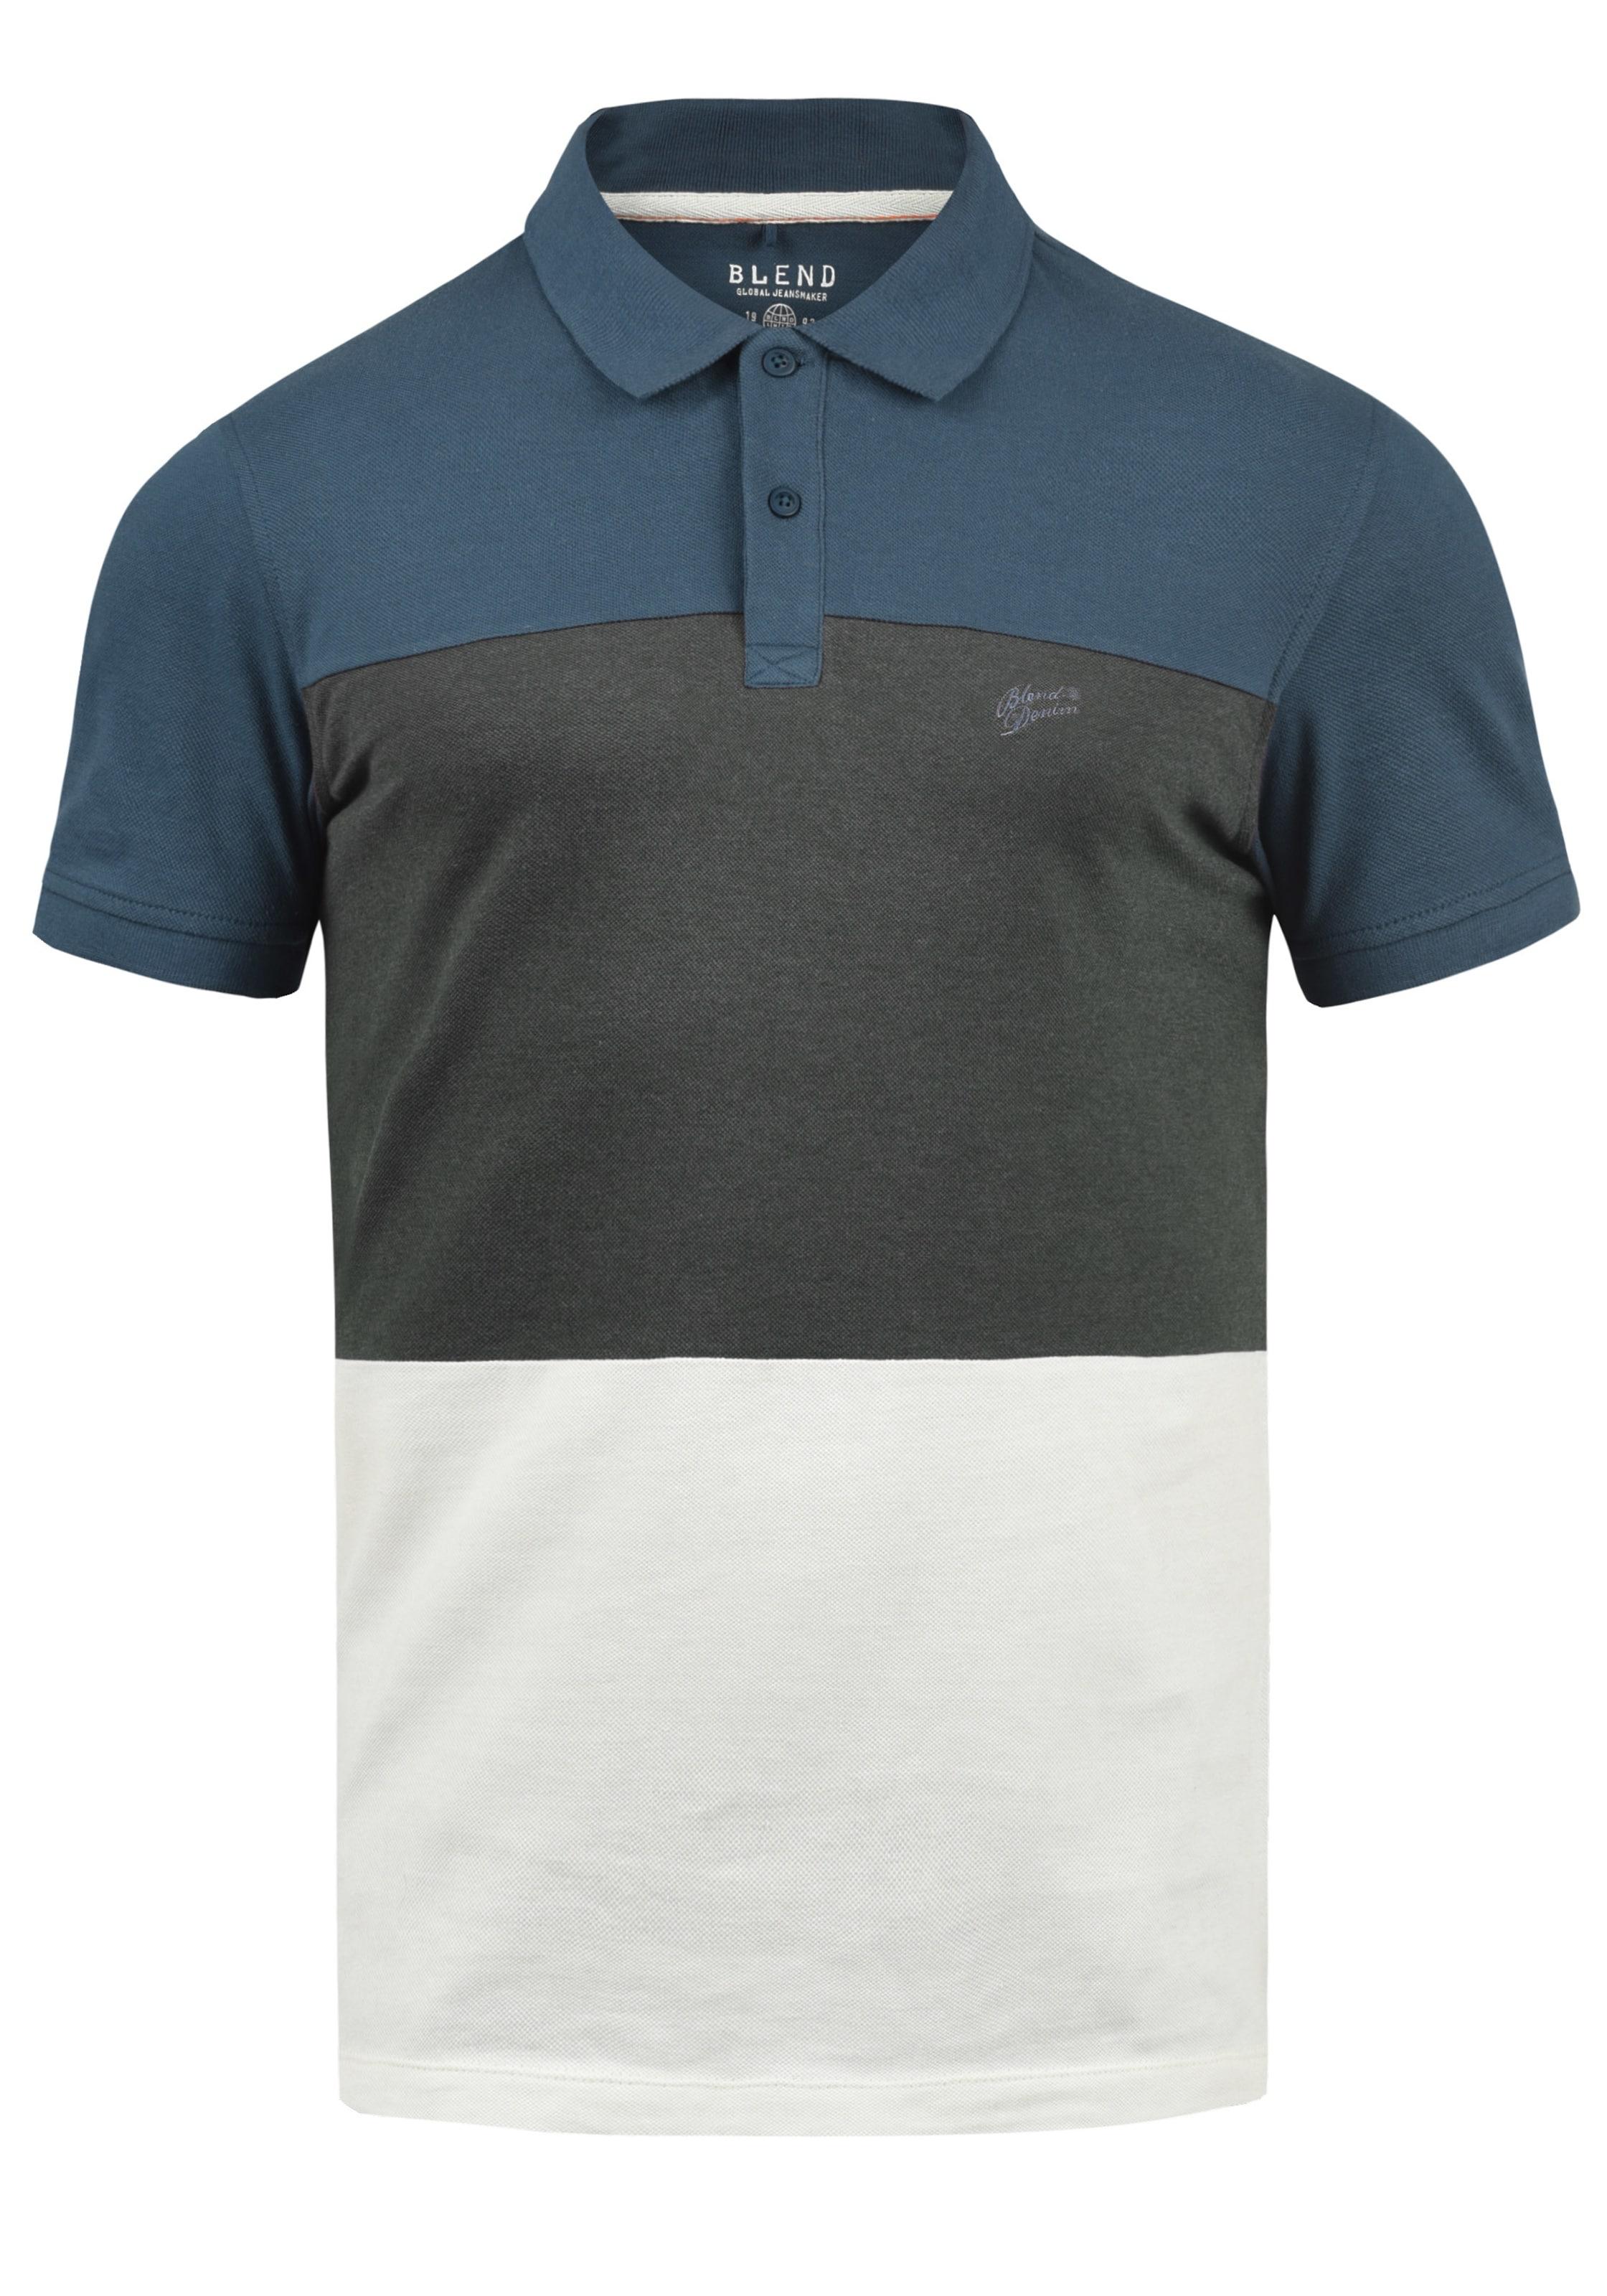 Poloshirt Blend Blend Poloshirt In Blau 'lauran' In 'lauran' SMpLzjUGVq